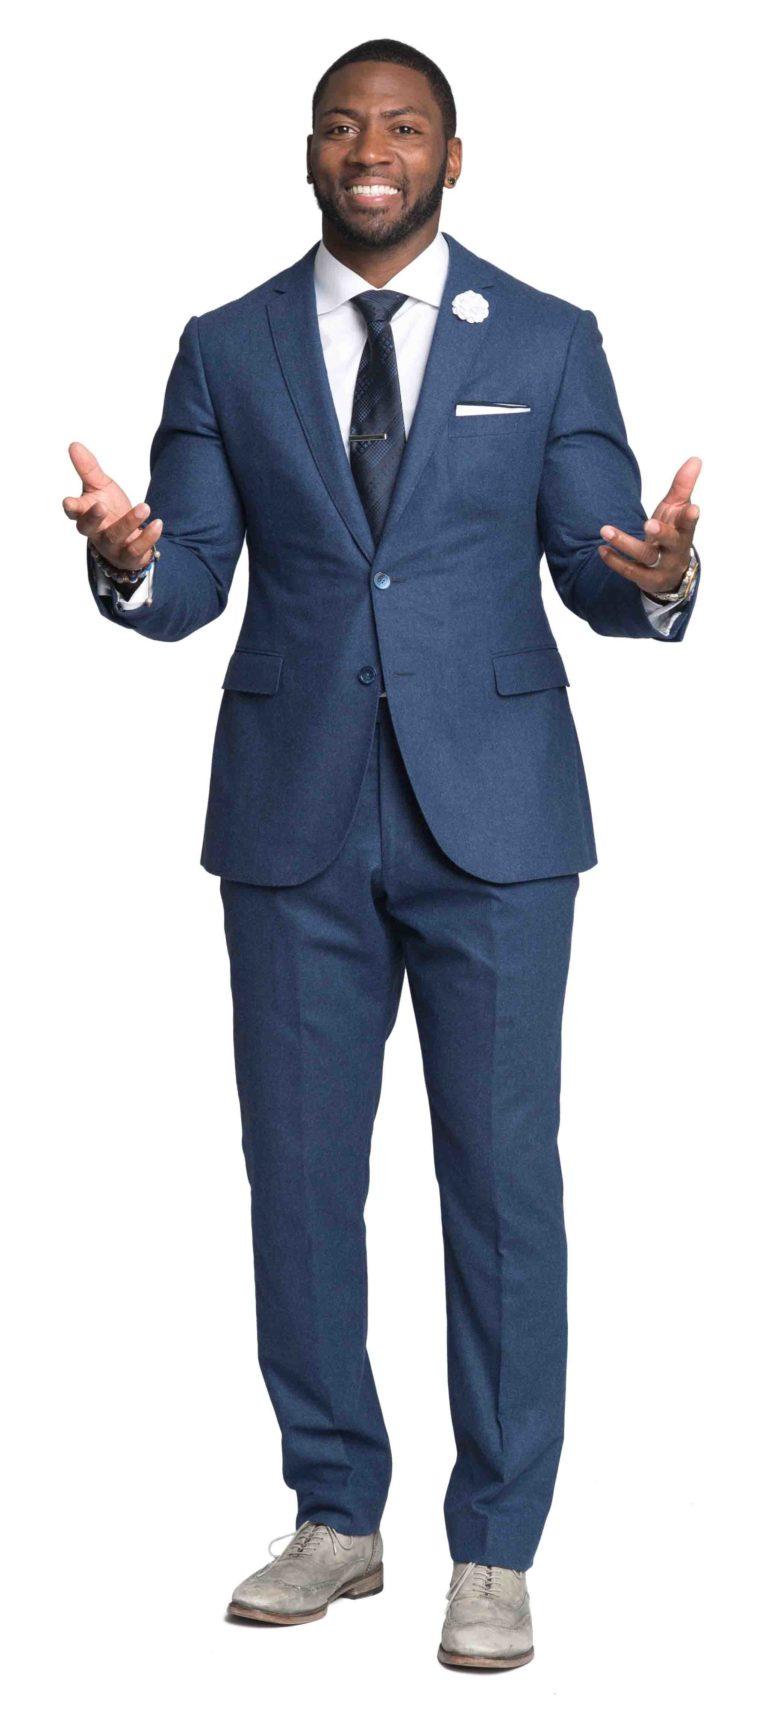 Ryan Clark in his ESPN attire